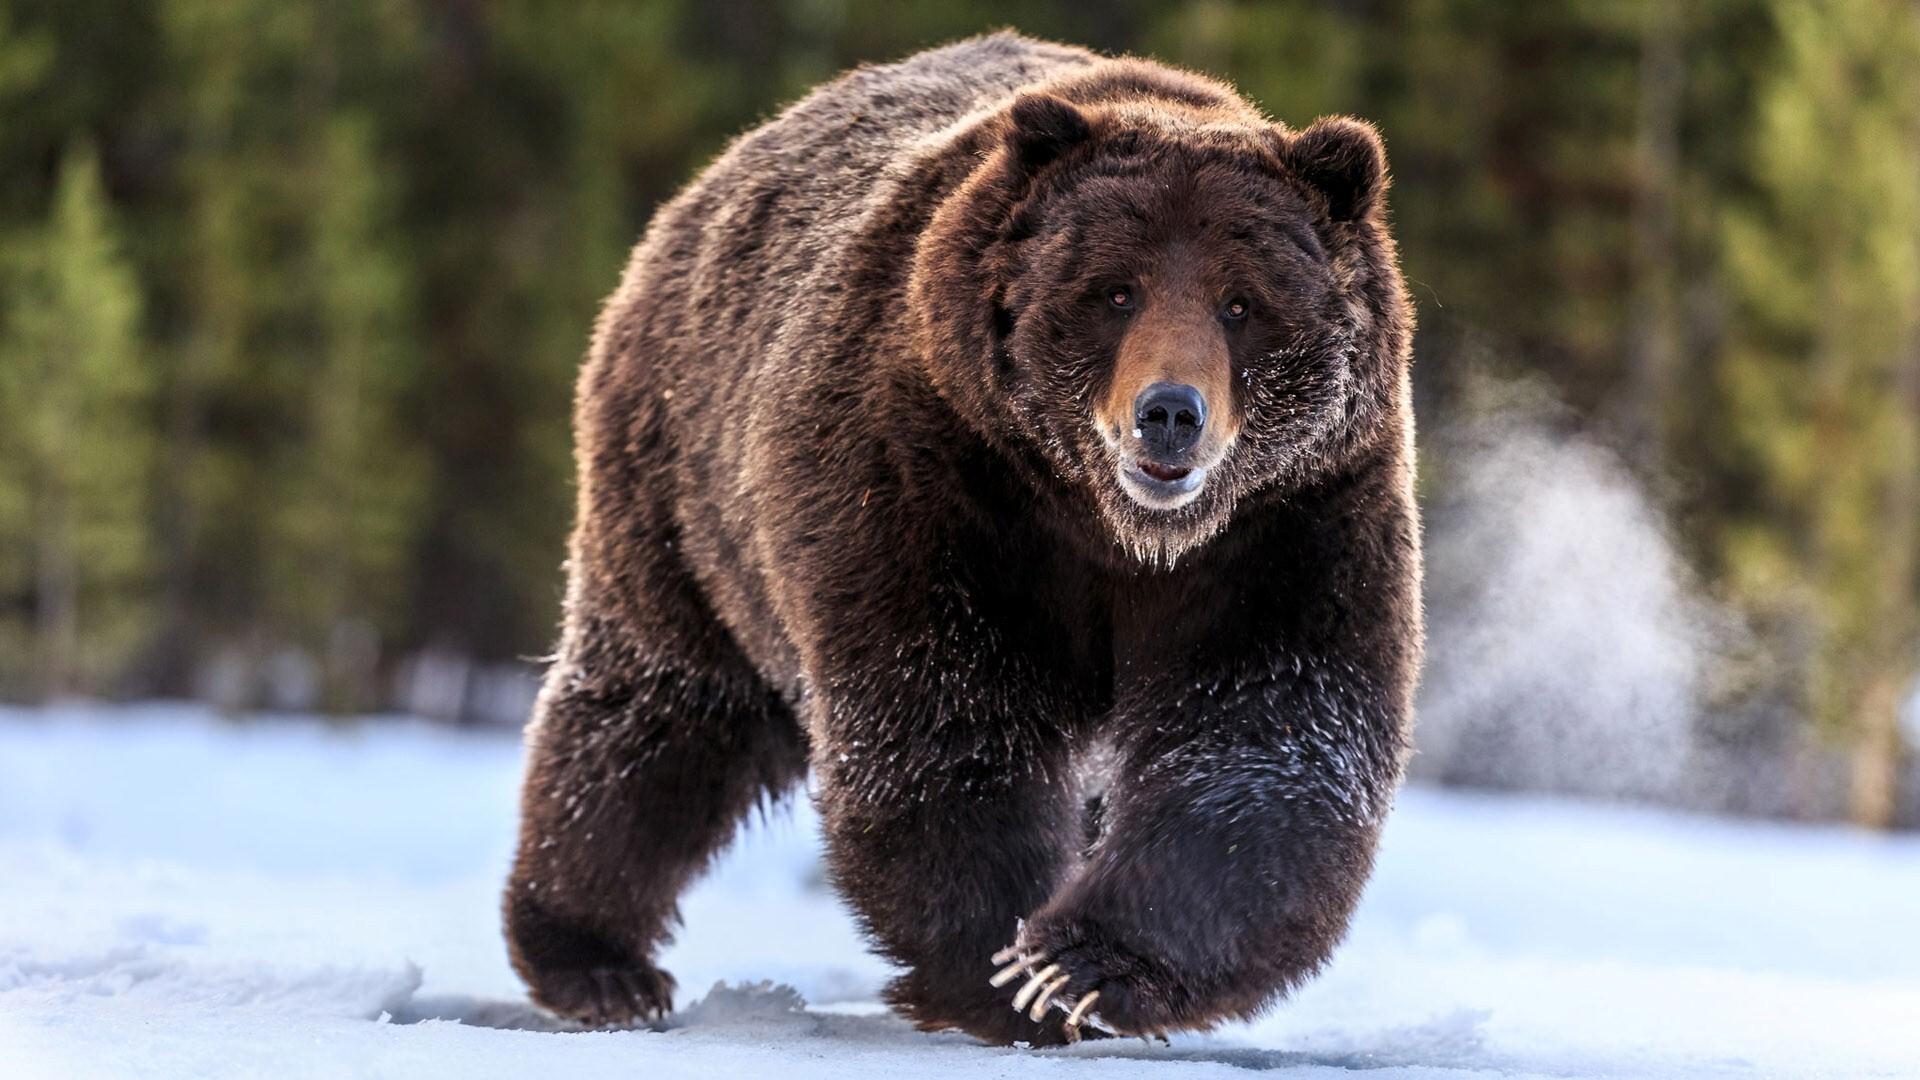 Animal Bear Wallpaper Hd Wallpapers